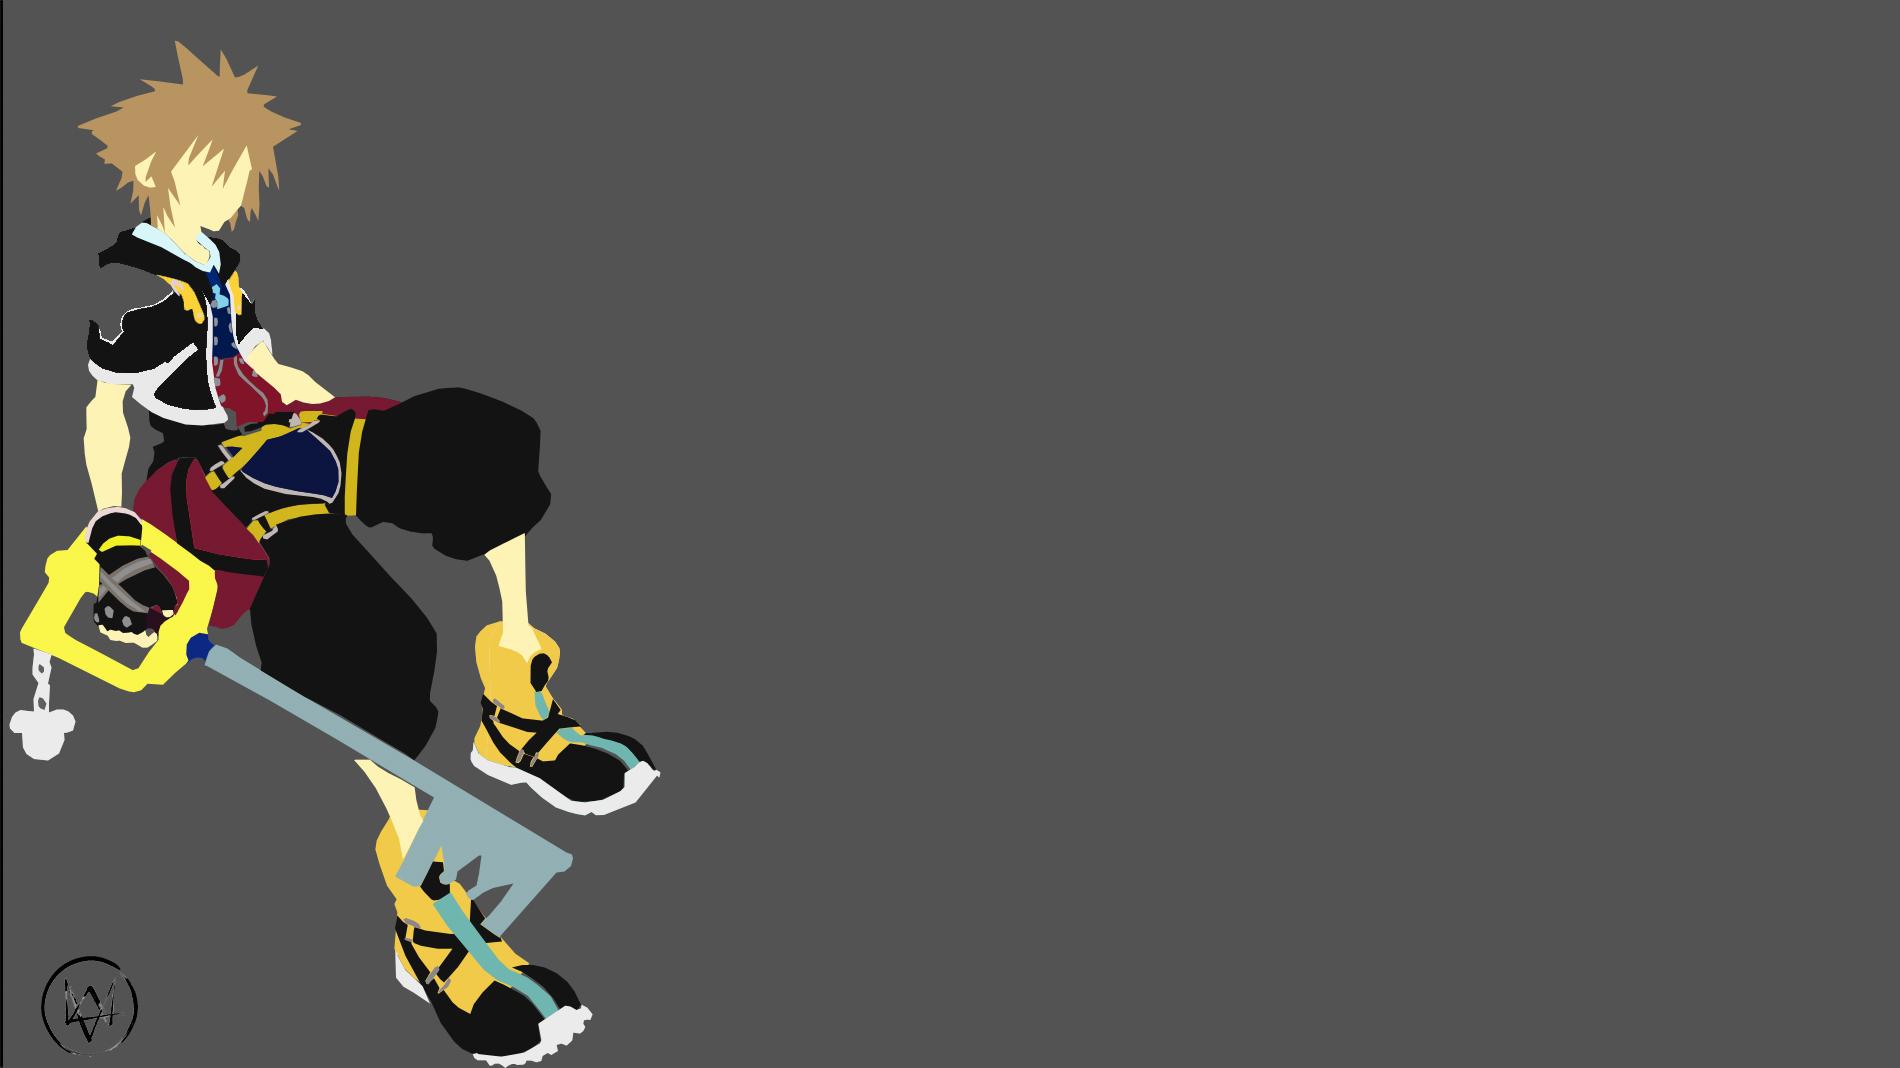 Sora (Kingdom Hearts) Minimalist by Lucifer012 on DeviantArt